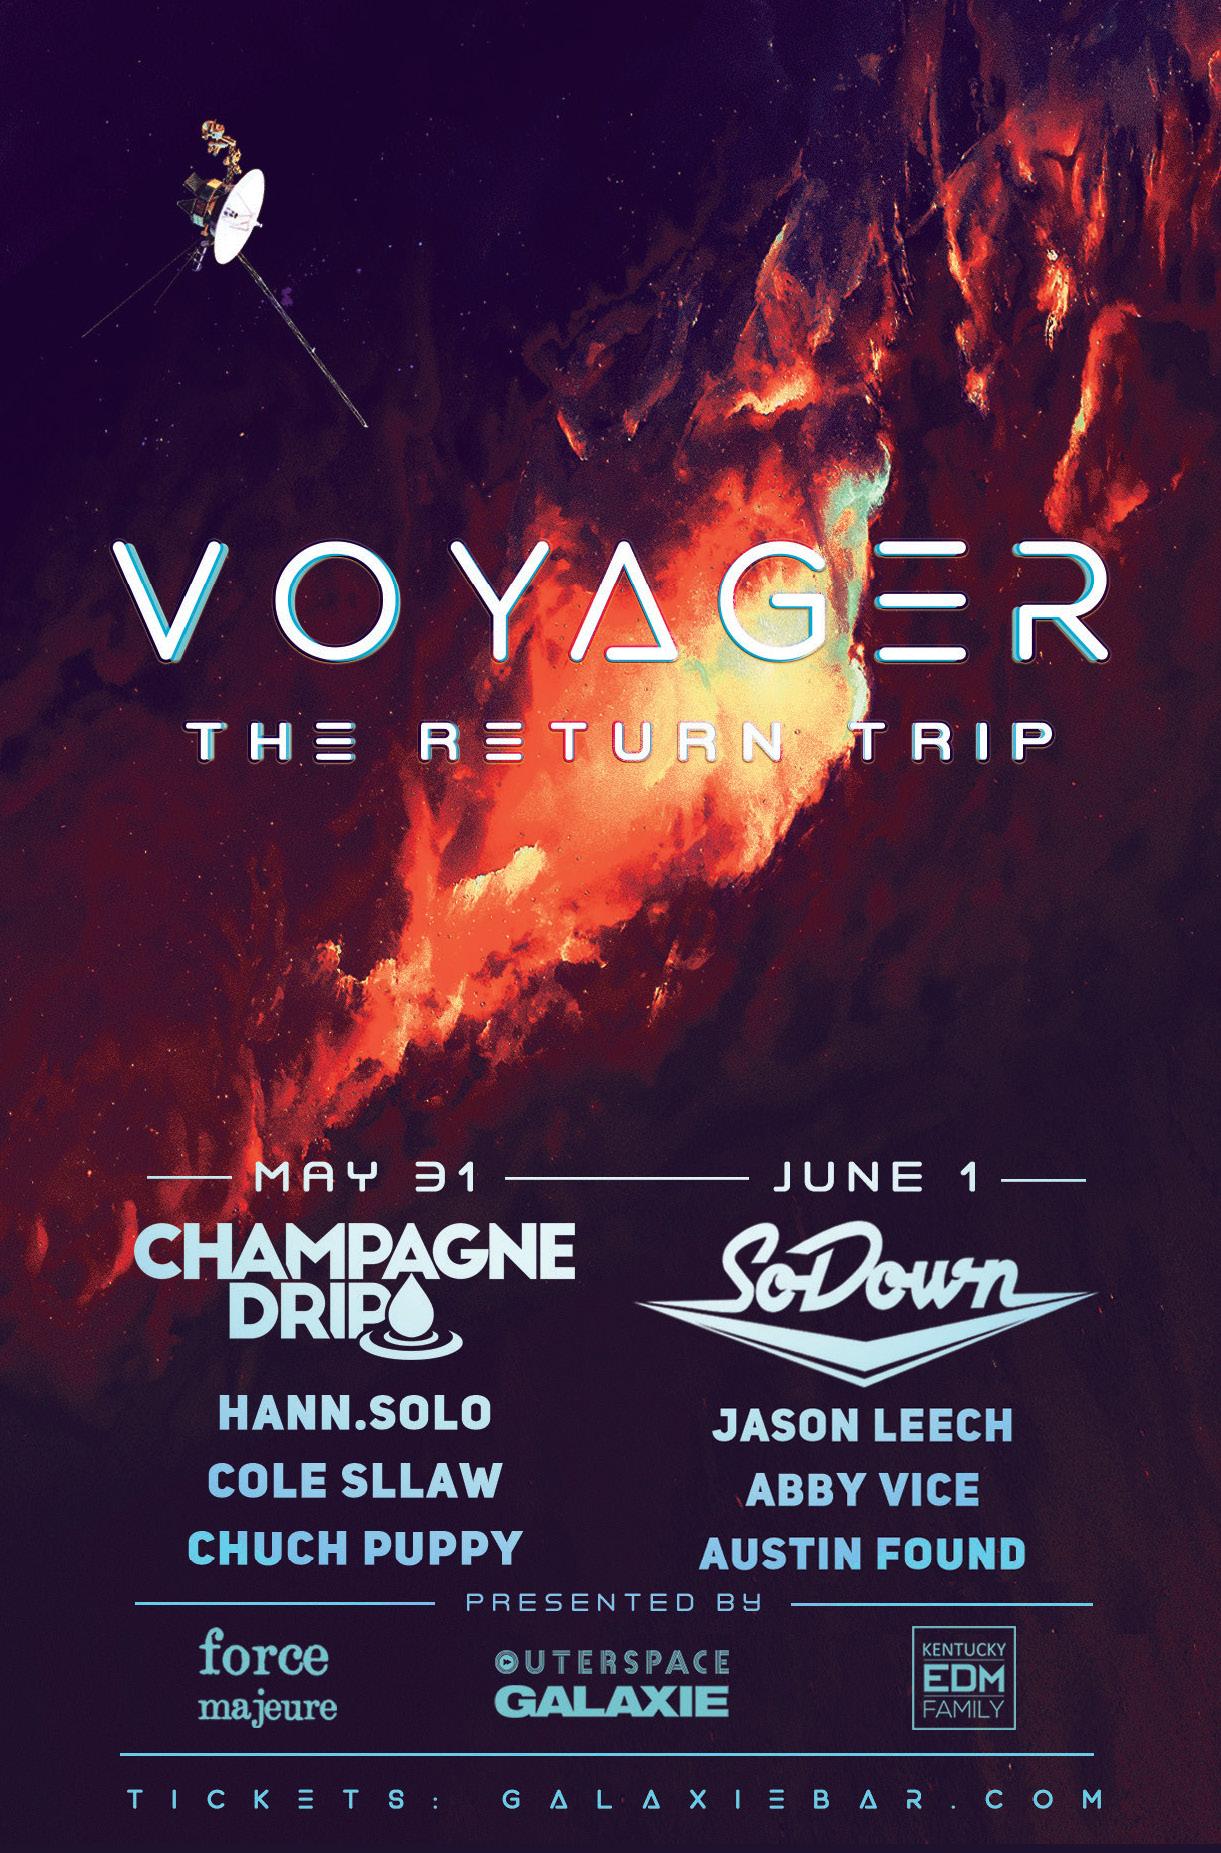 Voyager3 Poster (11x17).jpg